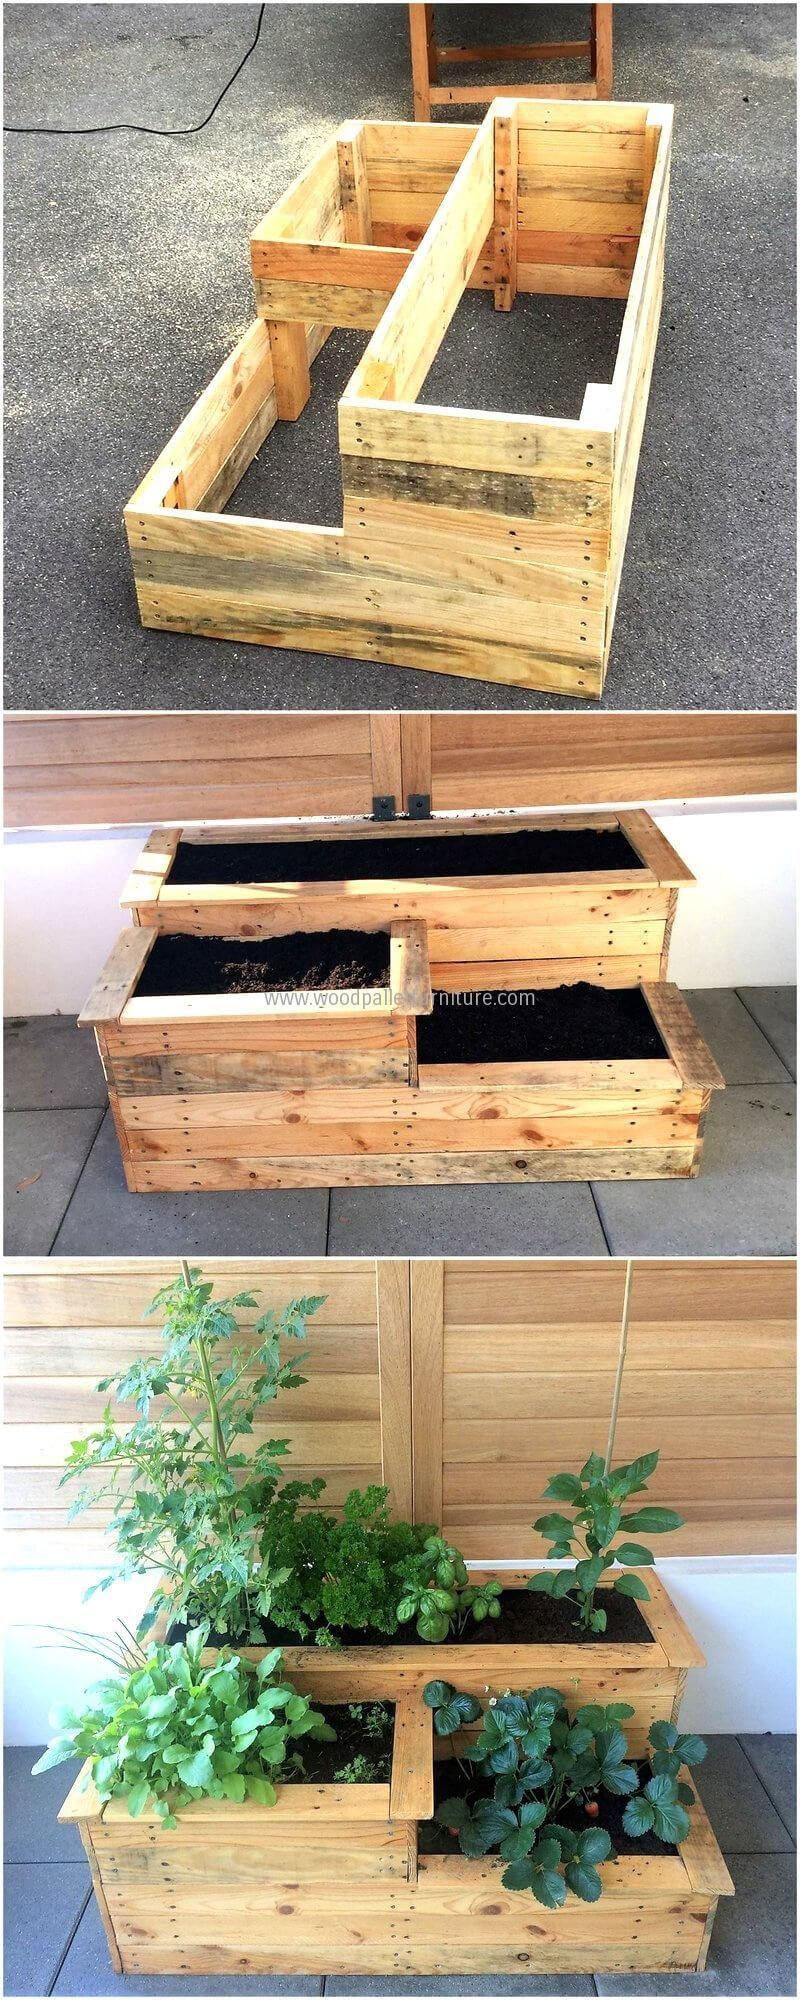 Repurposing Plans Shipping Wood Pallets Green Thumb